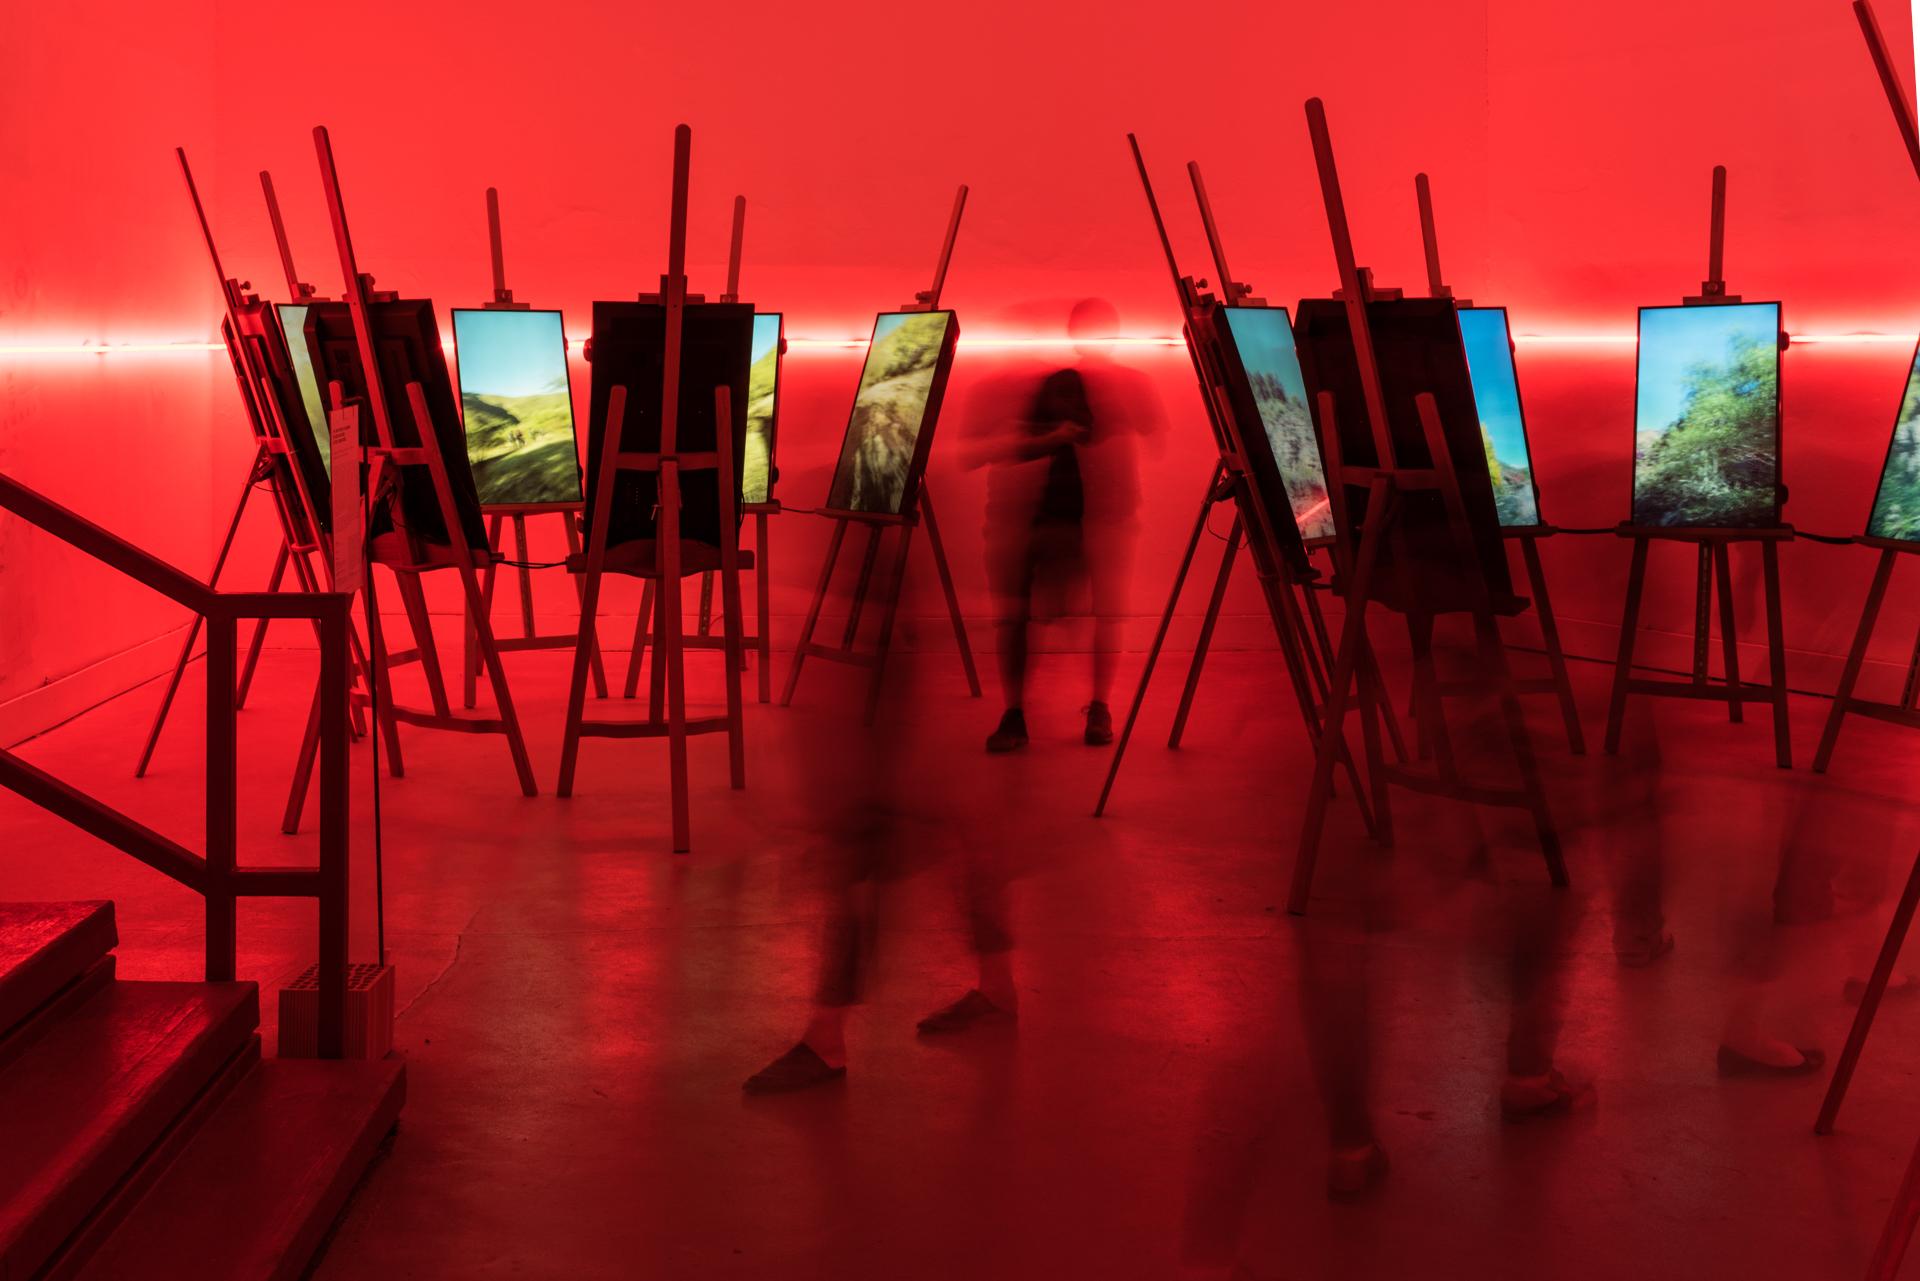 ANDES SHADOW La Biennale di Venezia 2016 © Gonzalo Puga-7736